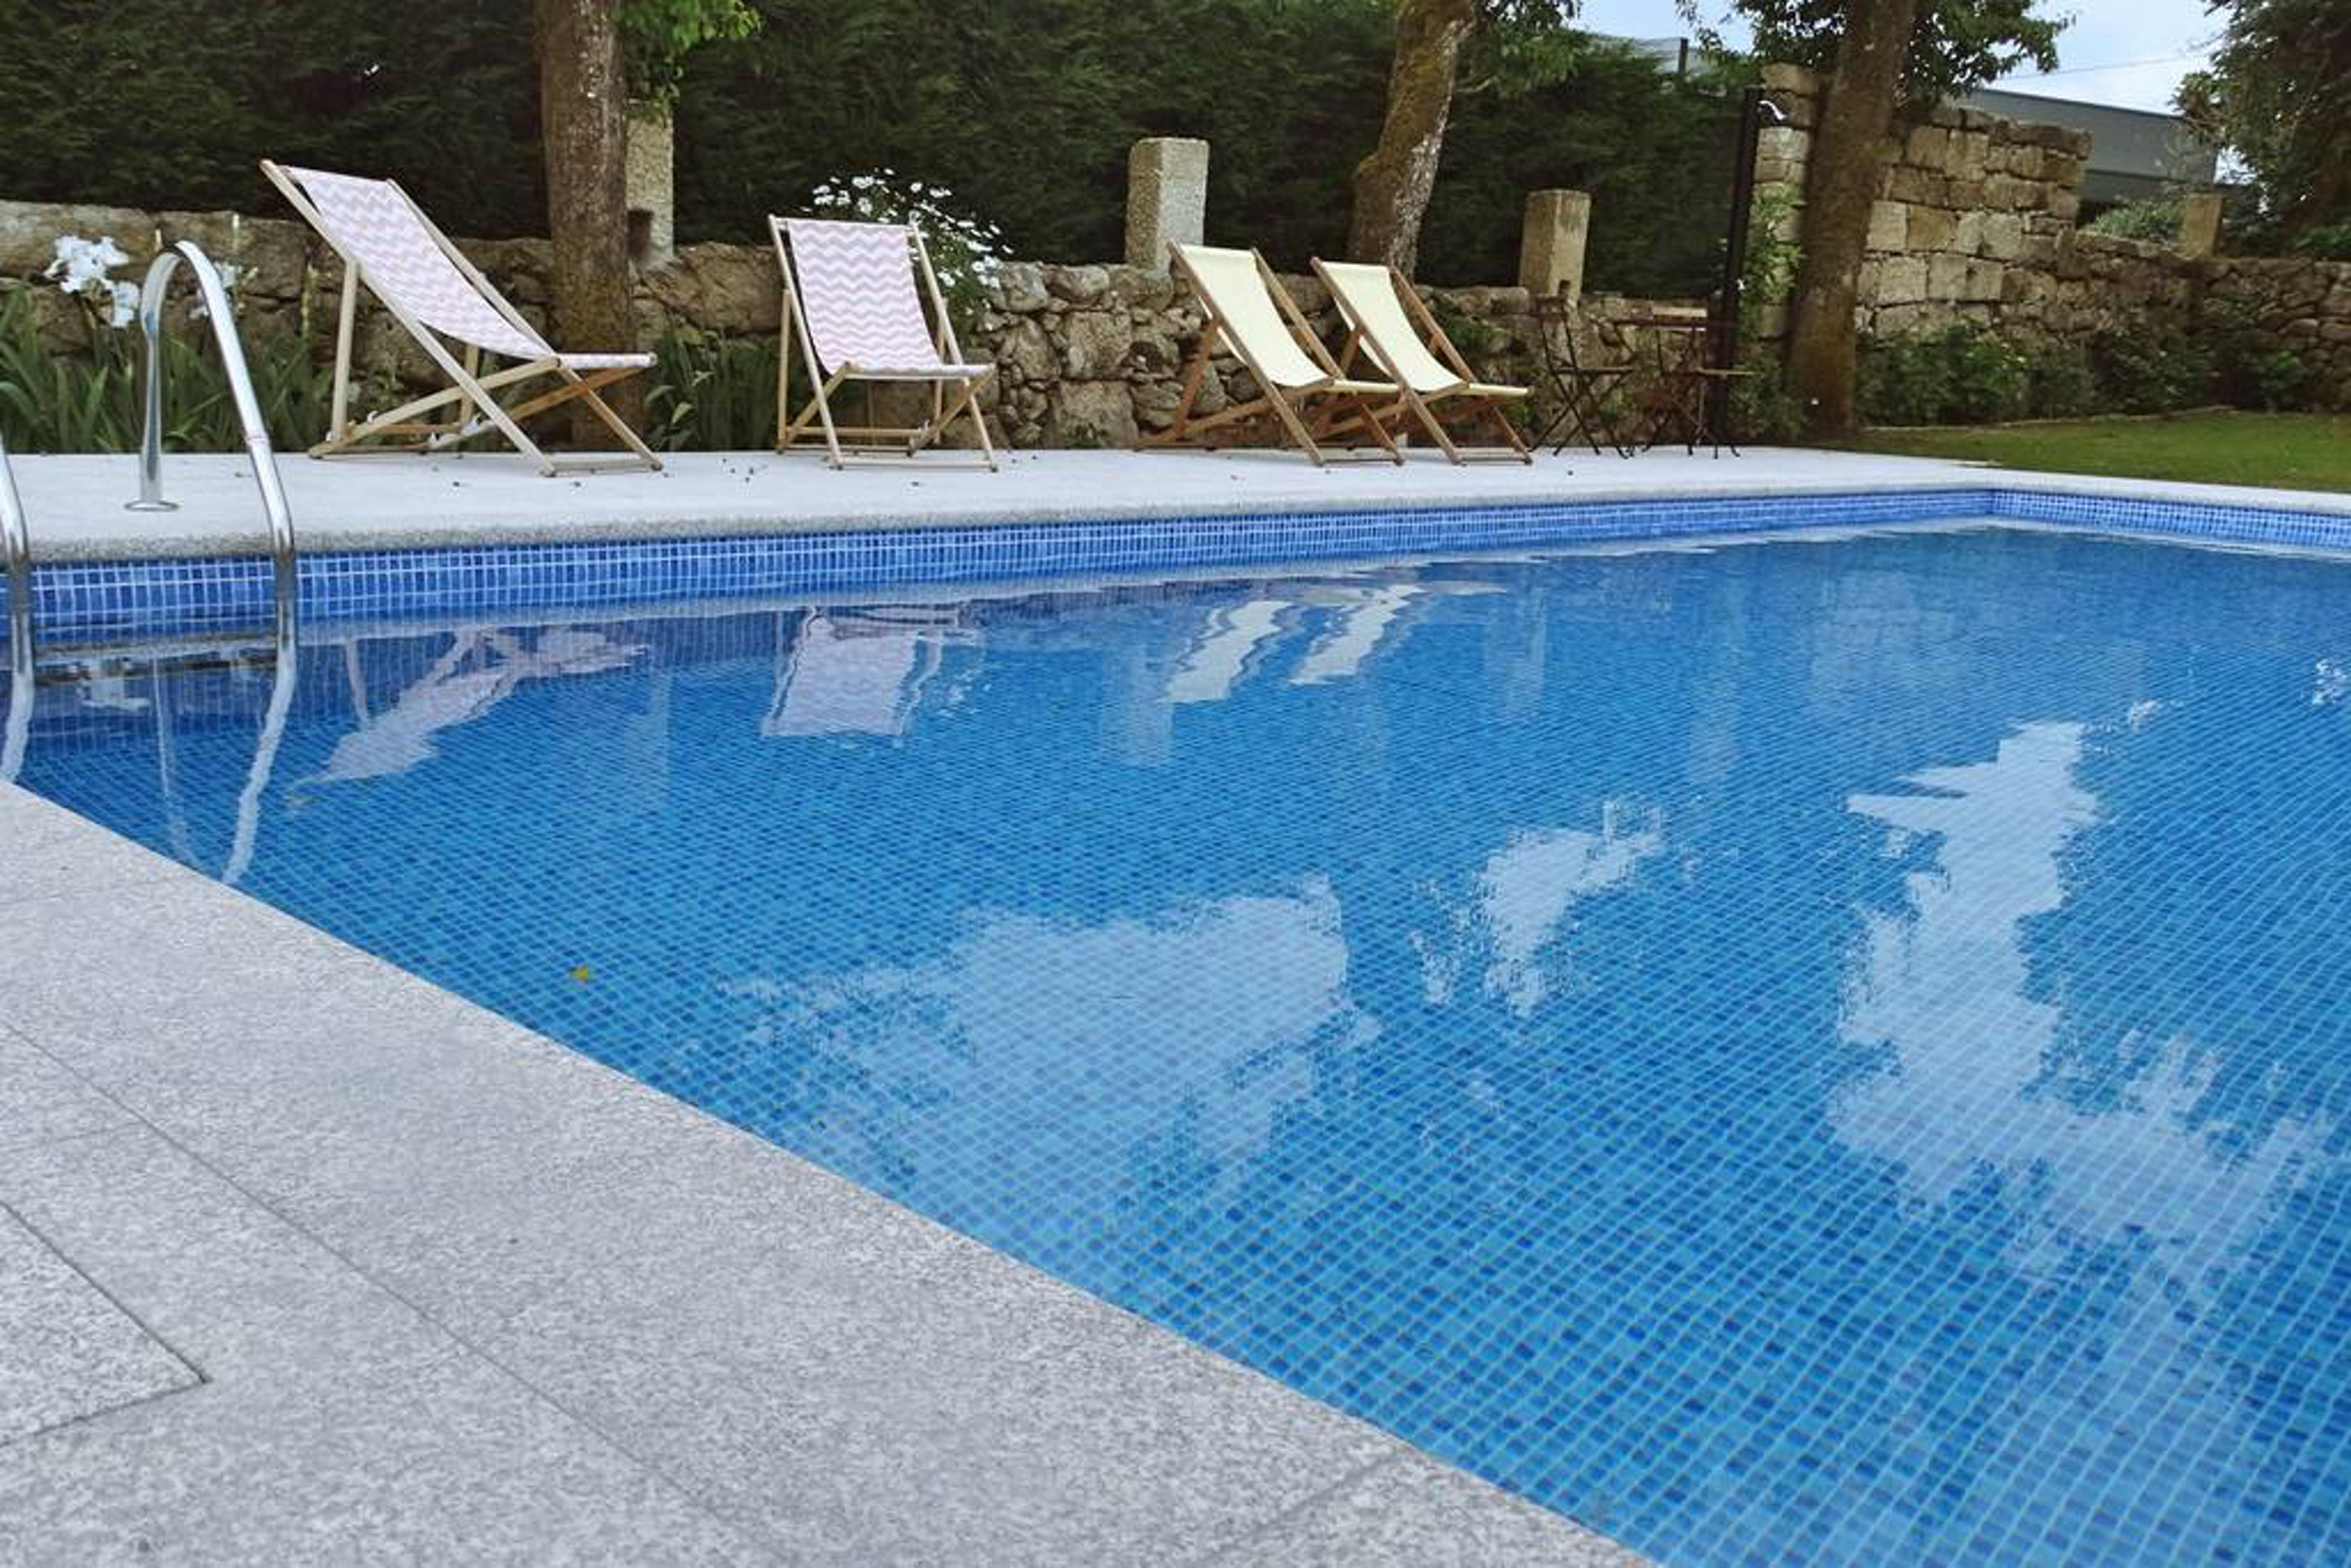 Holiday house Haus mit 3 Schlafzimmern in Vouzela mit bezauberndem Seeblick, privatem Pool, eingezäuntem (2560102), Vouzela, , Central-Portugal, Portugal, picture 10